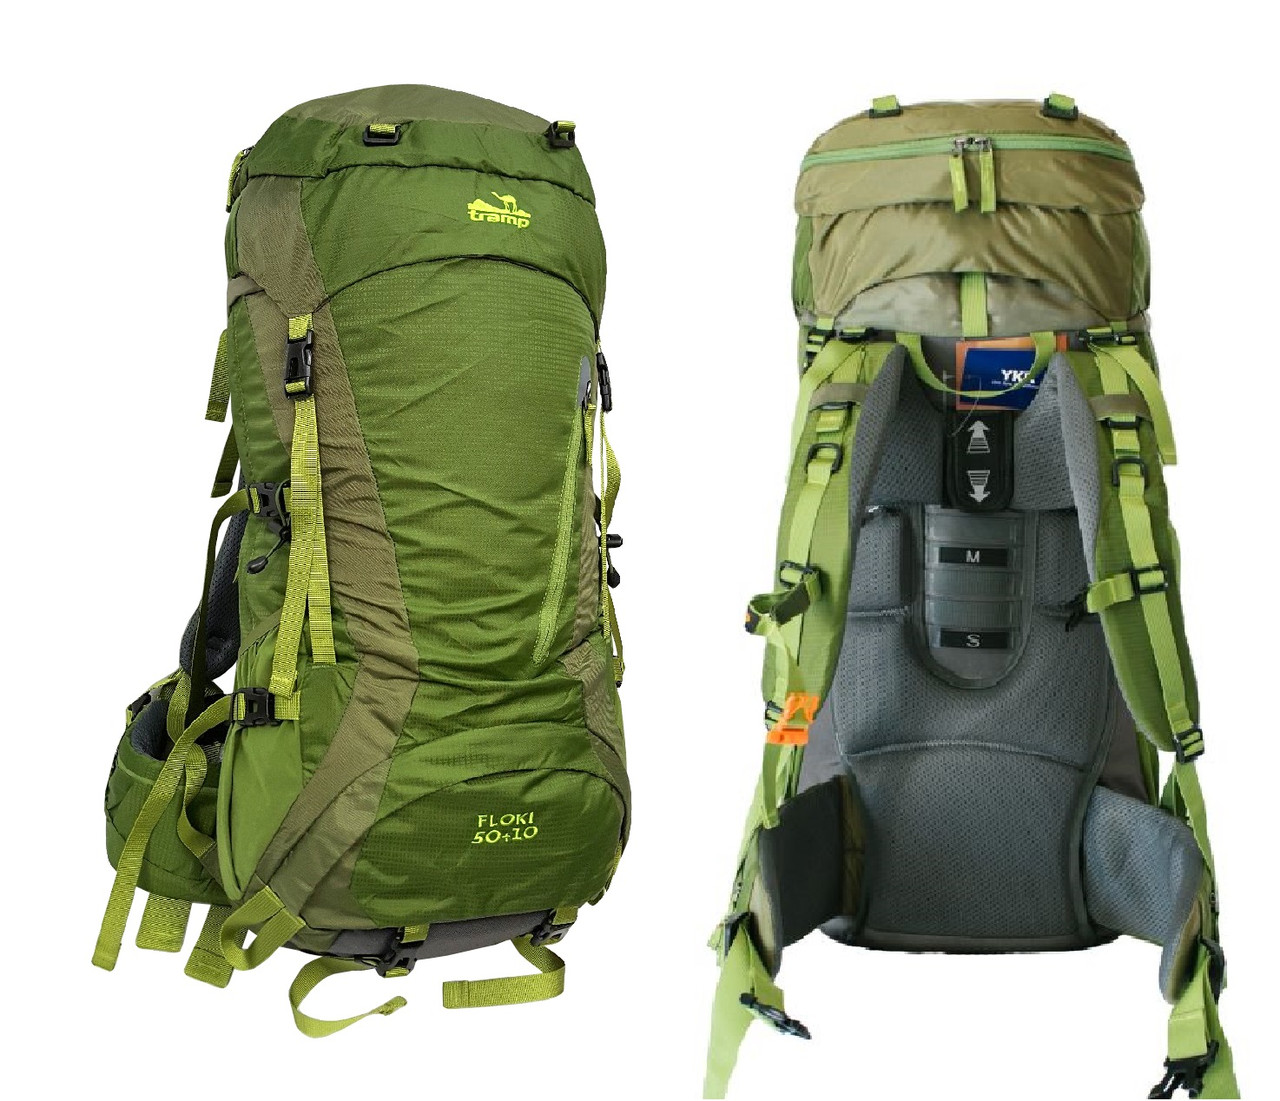 Рюкзак туристический 50 + 10 л Tramp Floki зеленый. Рюкзак туристический 60л.